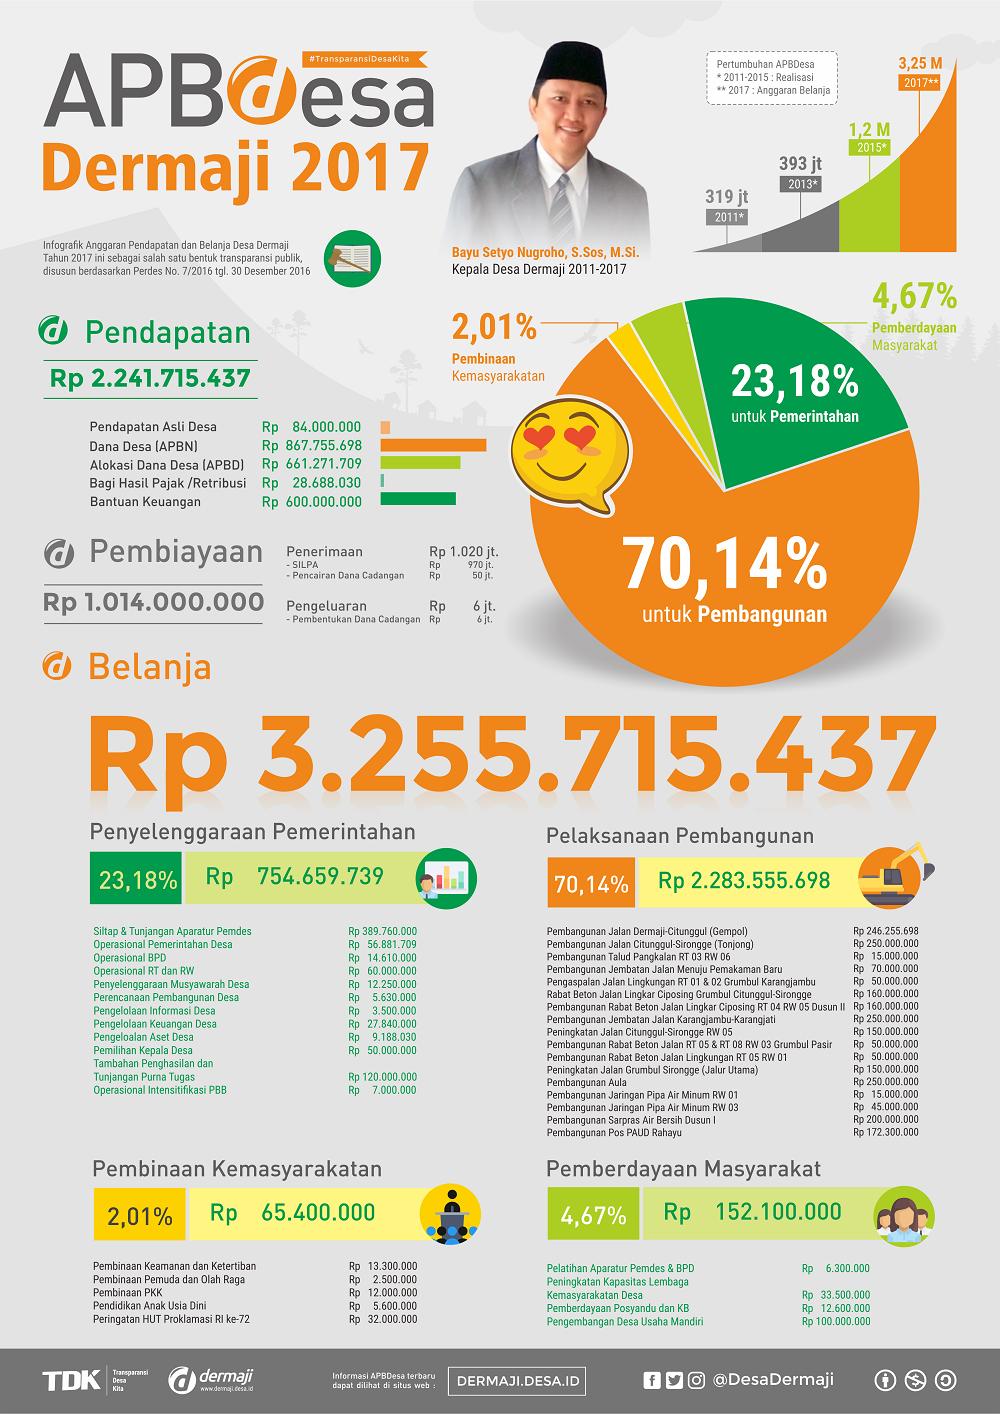 Infografik APBDesa Dermaji 2017